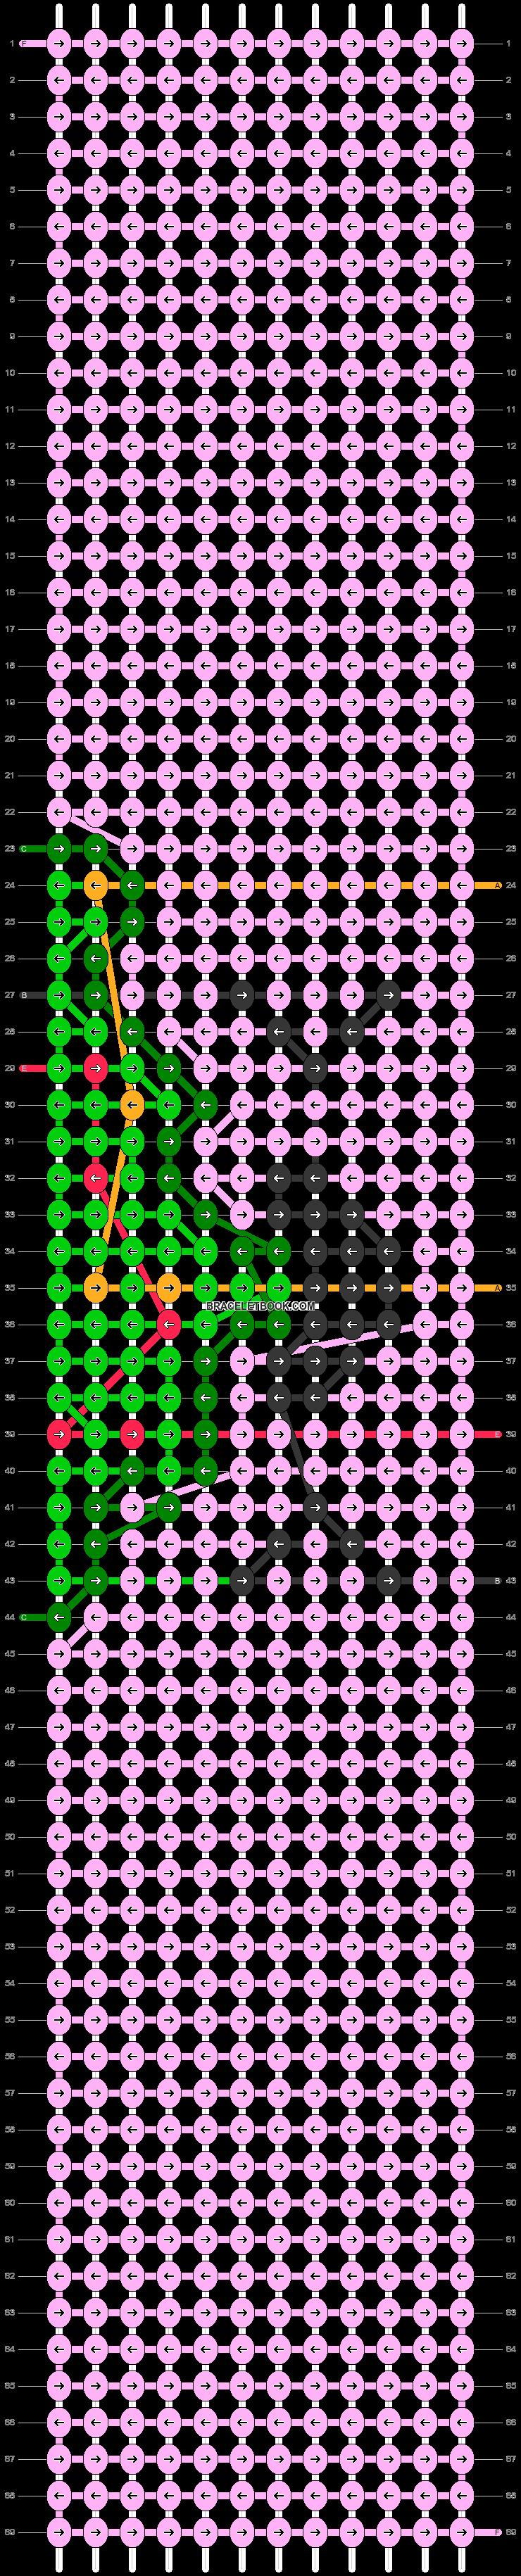 Alpha pattern #45330 pattern